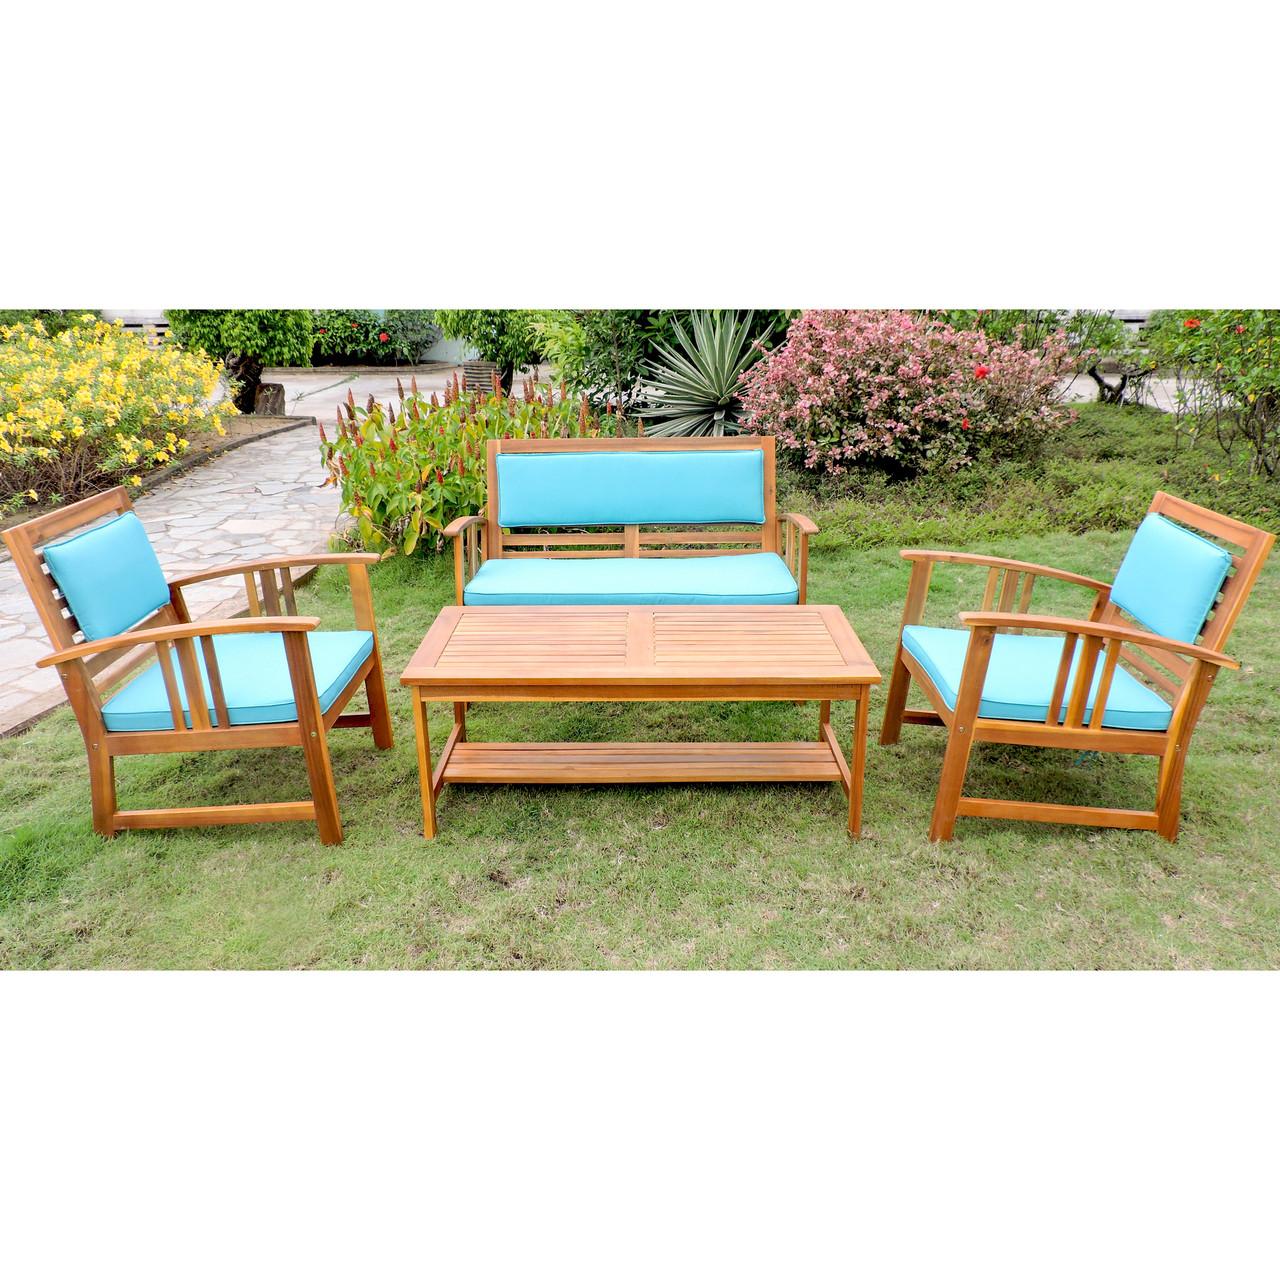 International Caravan Patio Furniture.International Caravan Royal Tahiti Brisbane Acacia Wood 4 Piece Settee Group With Cushions